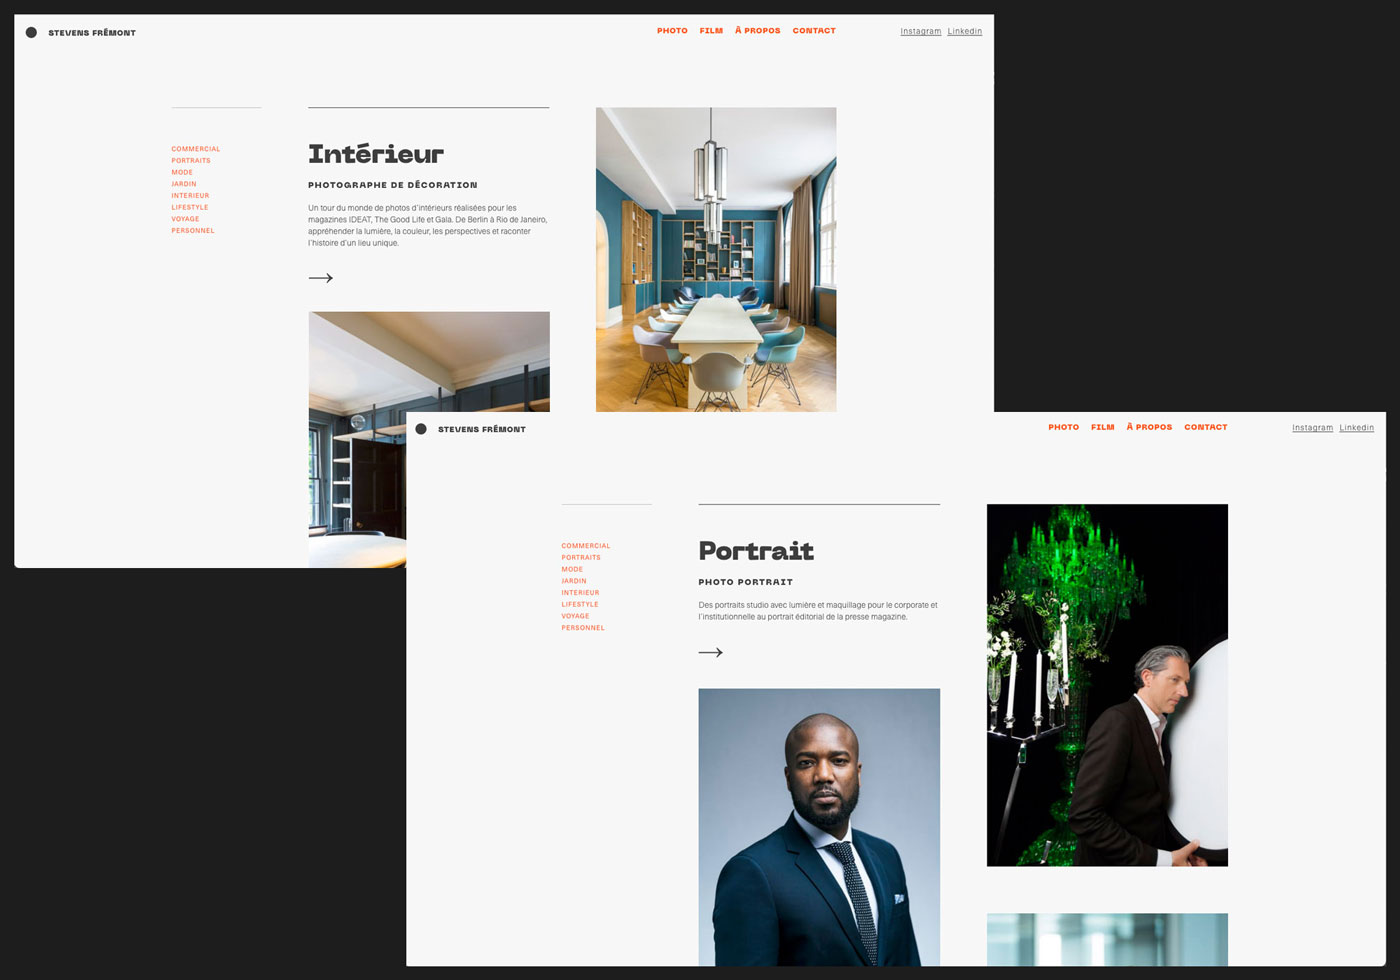 webdesigner freelance webflow site internet